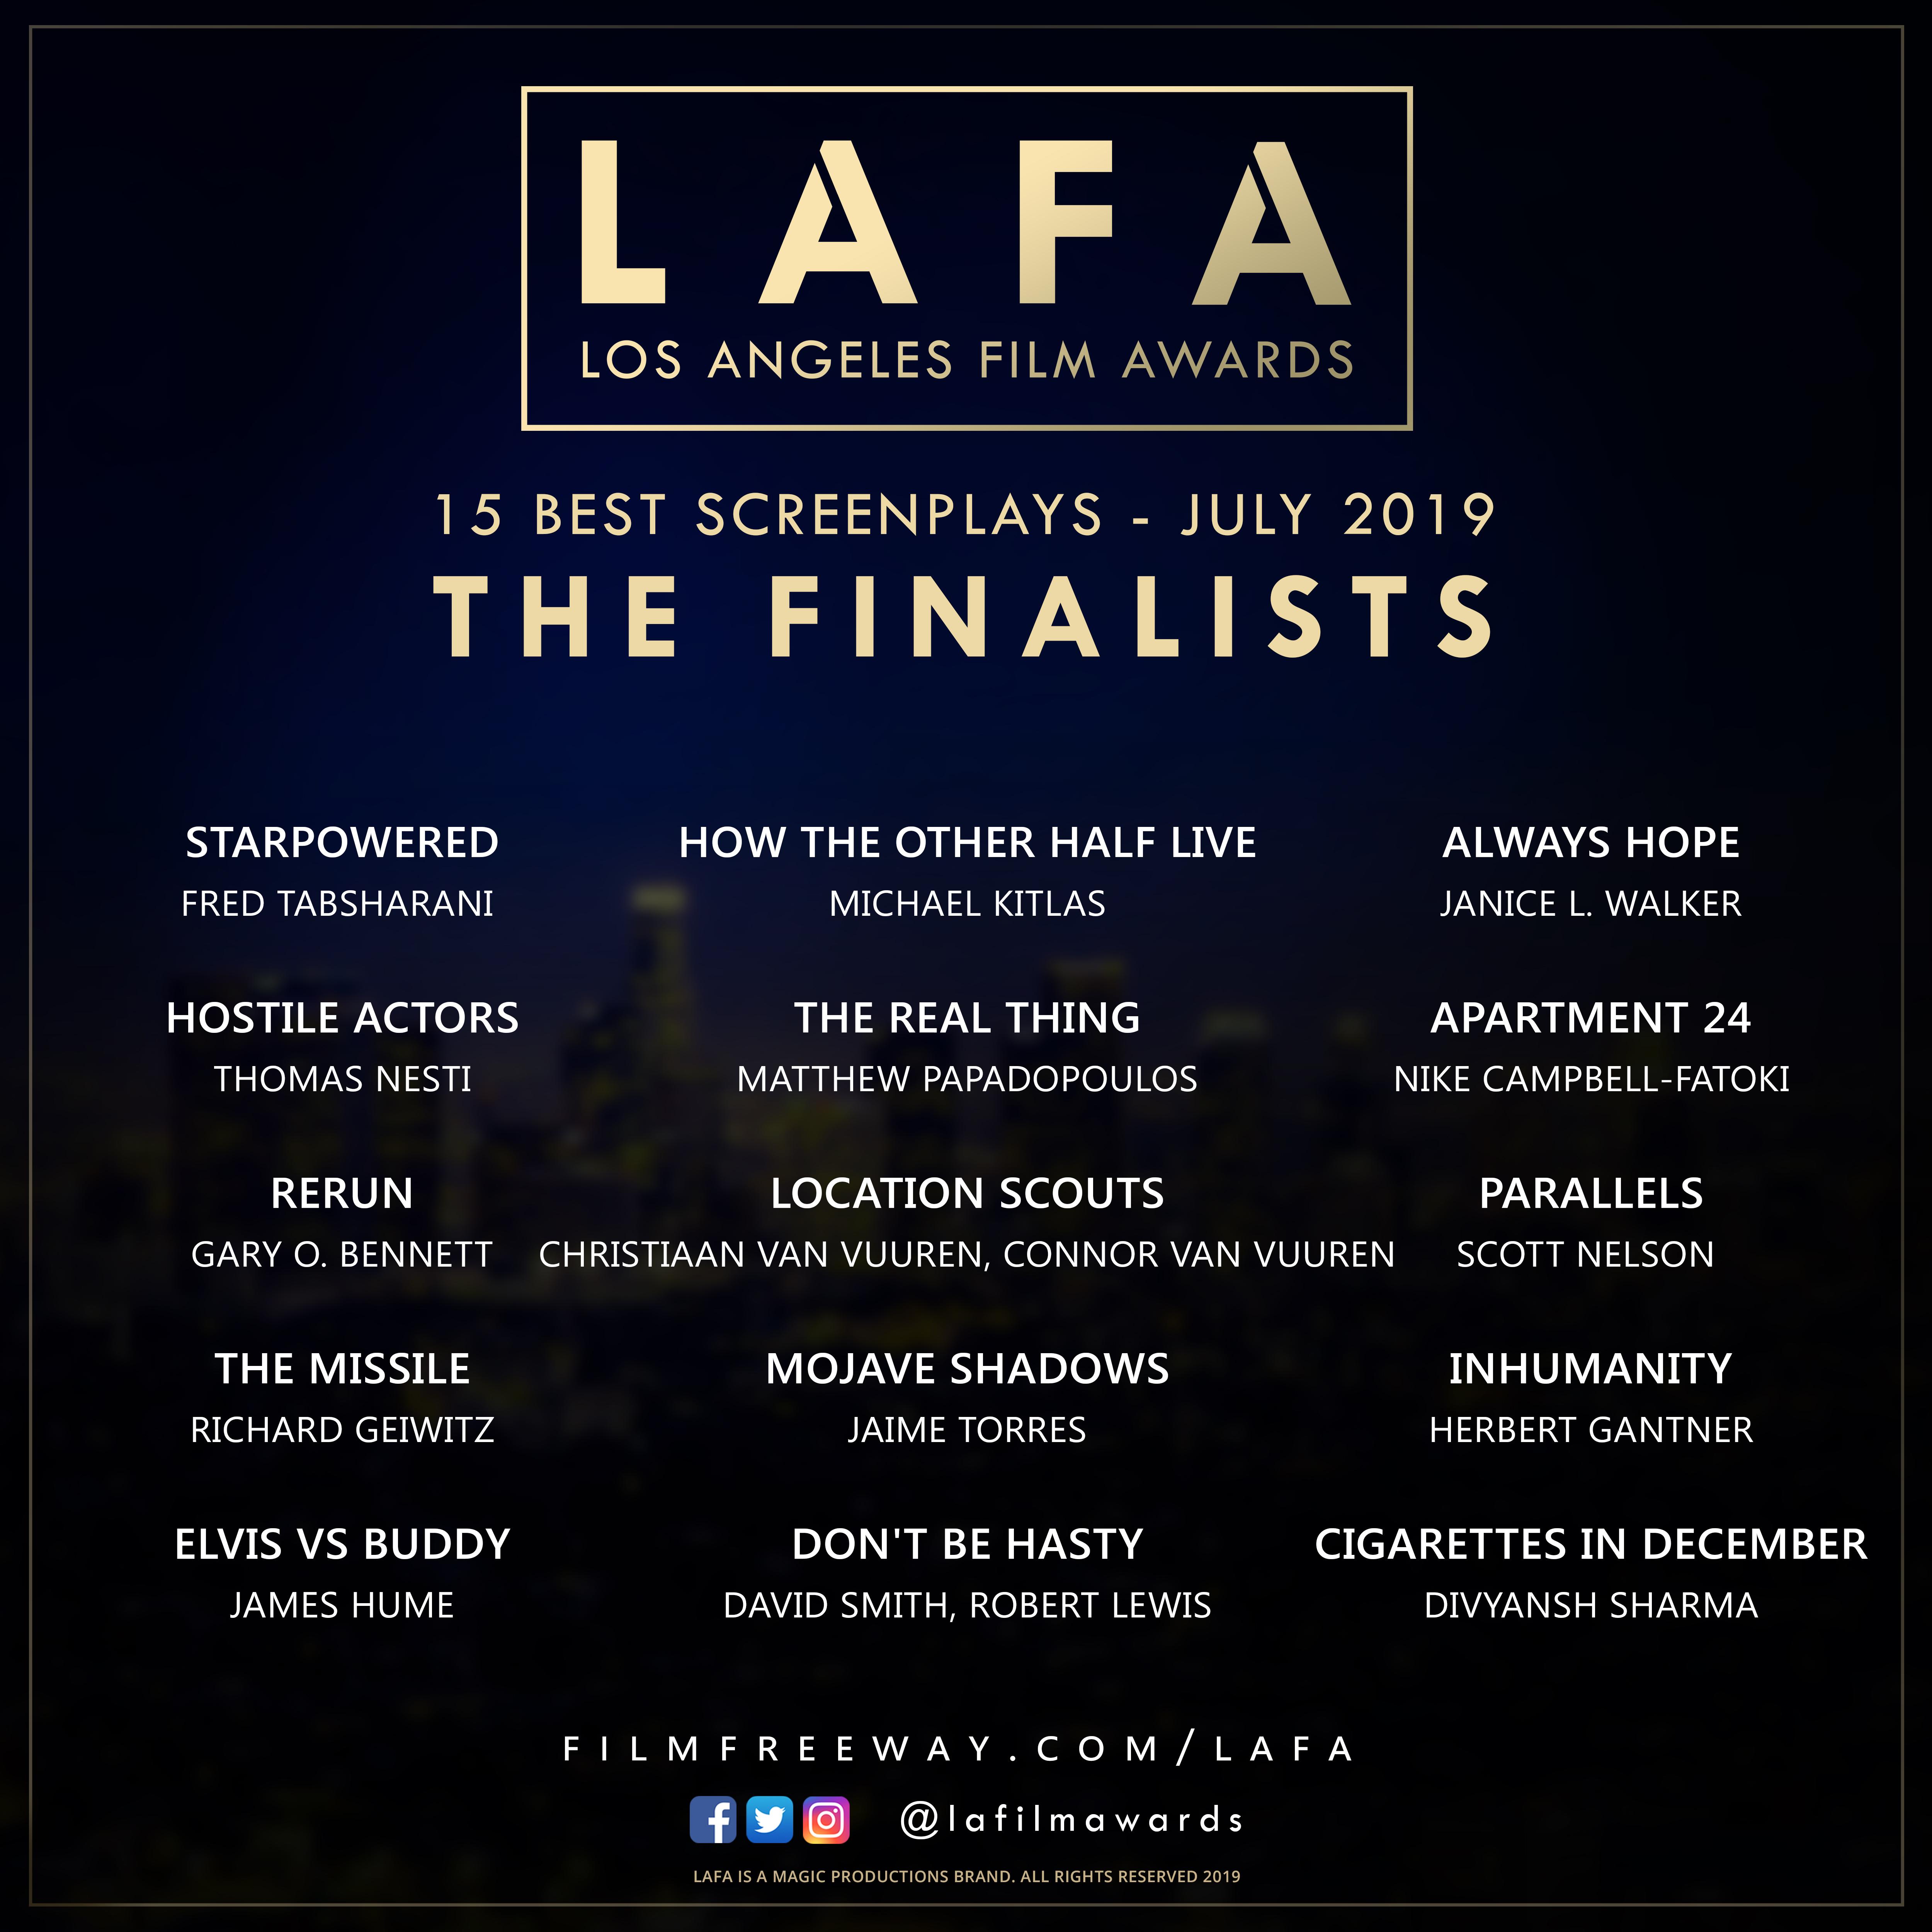 LAFA SCREENPLAY FINALISTS 2019